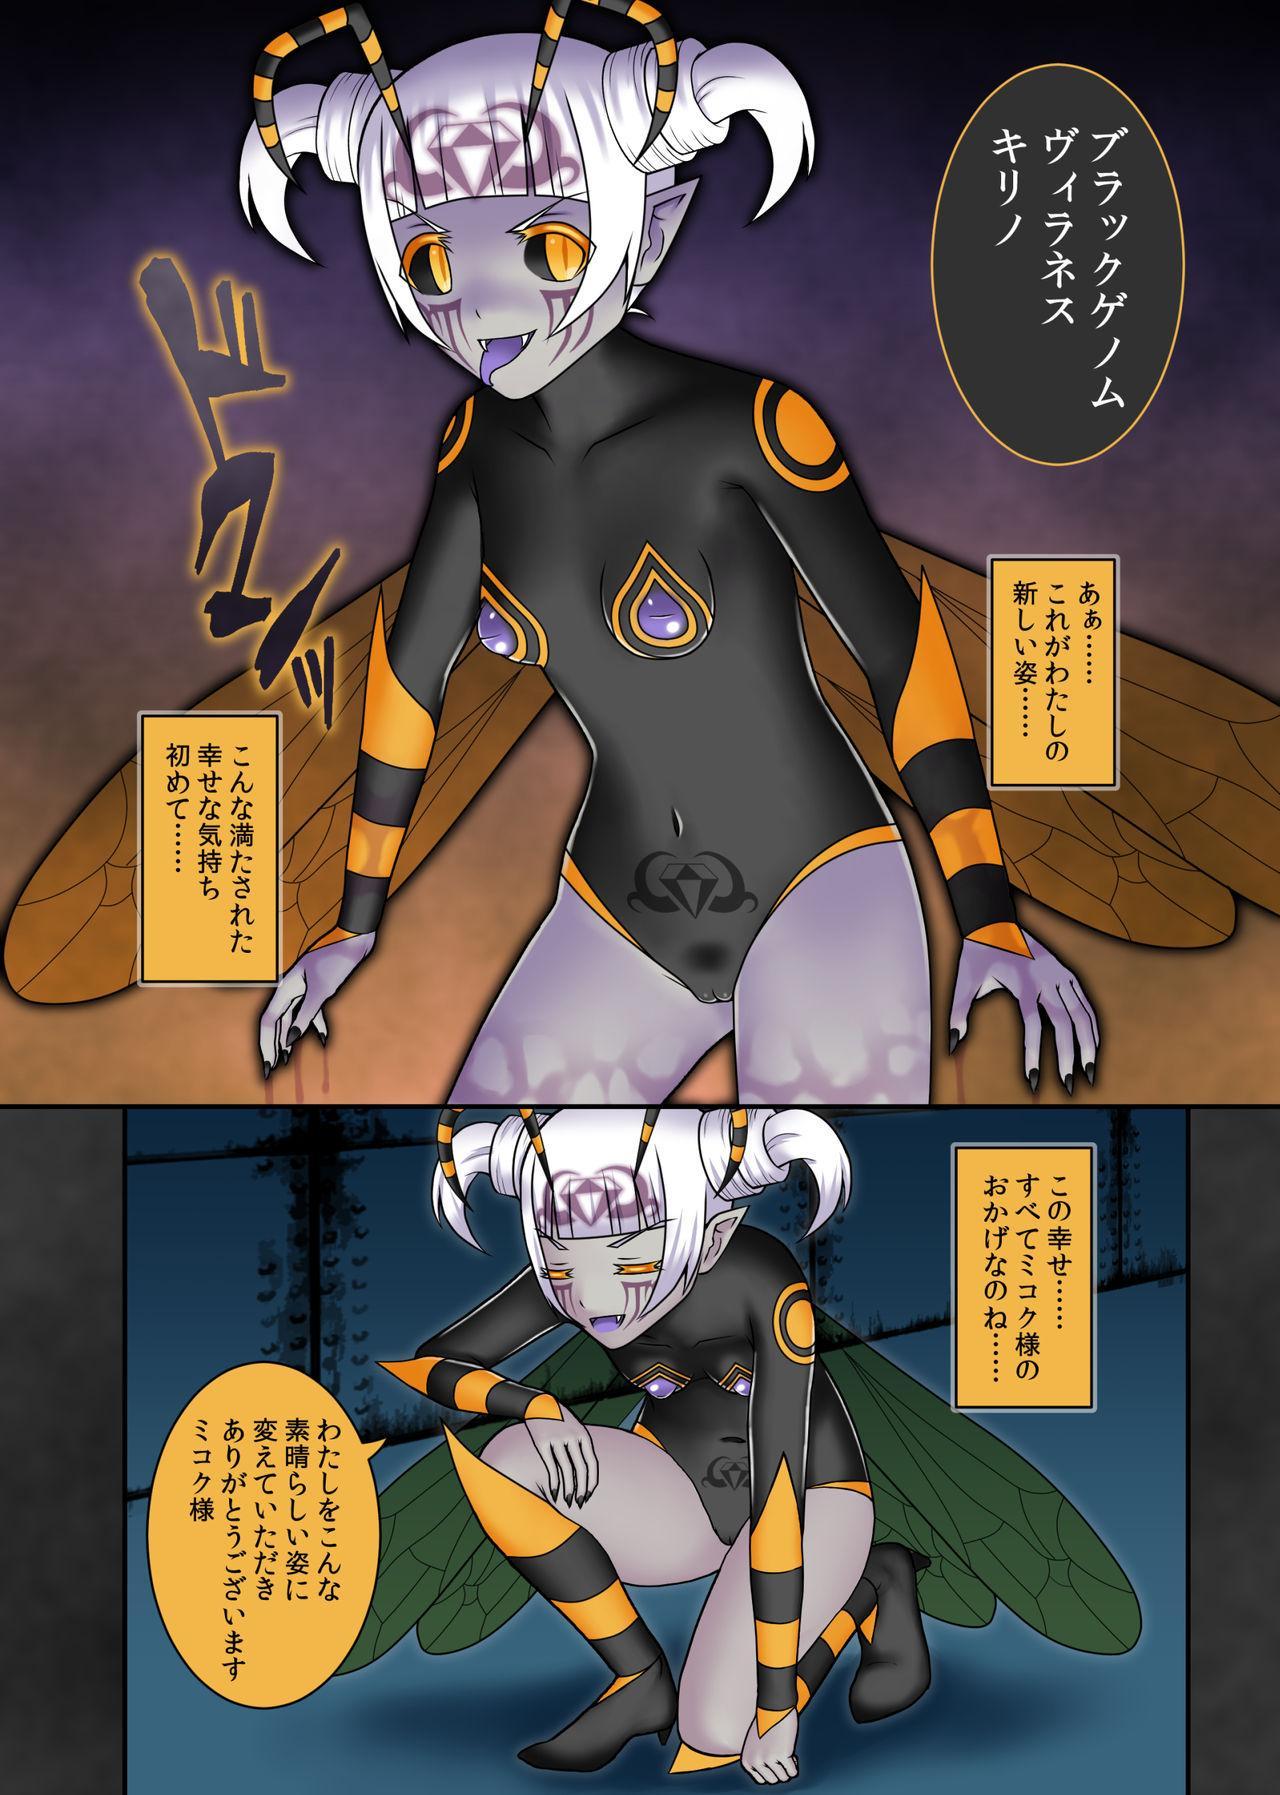 [STUDIO HP+ (IceLee)] Teisou Sentai Virginal Colors Dai-Go-wa 30